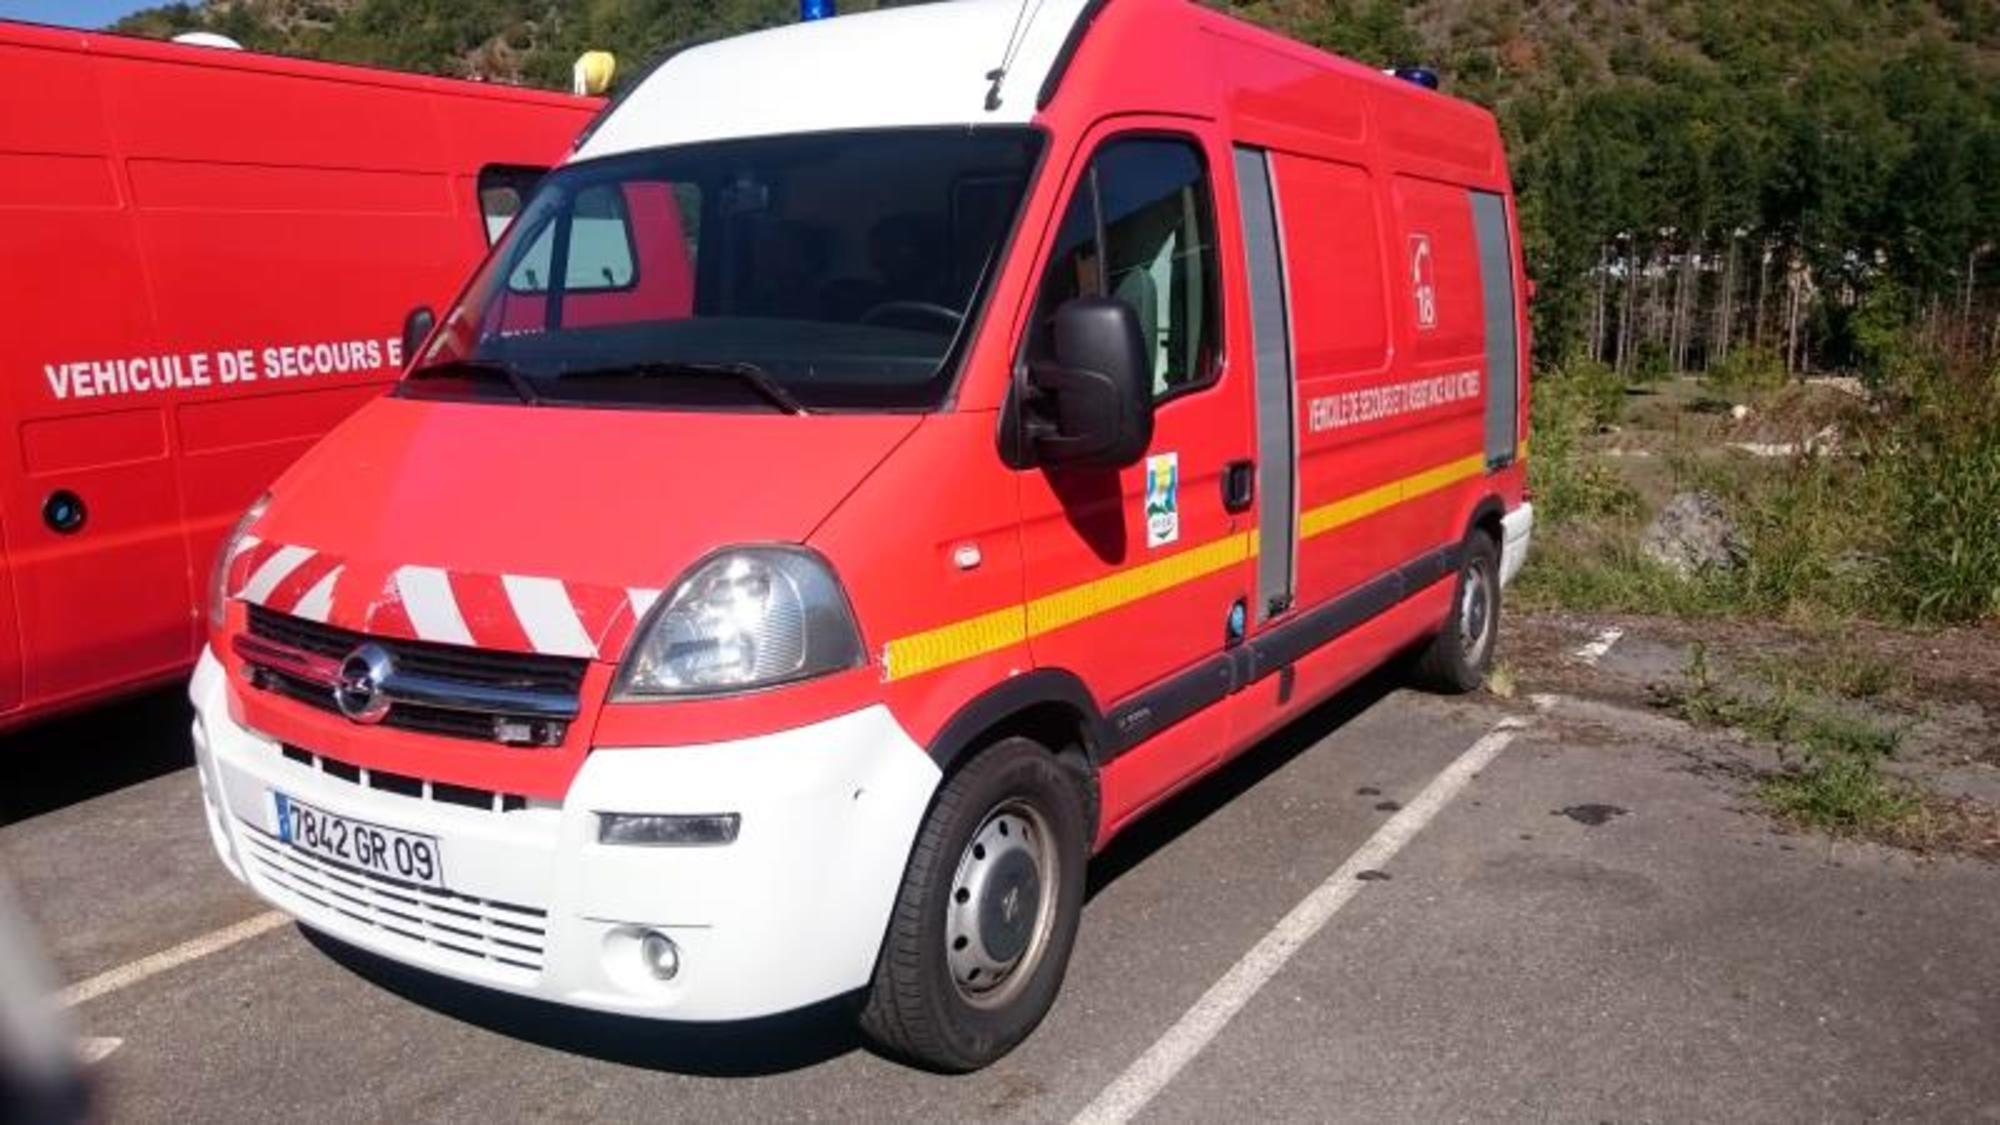 ambulance sapeurs pompiers opel movano utilitaire d 39 occasion aux ench res agorastore. Black Bedroom Furniture Sets. Home Design Ideas